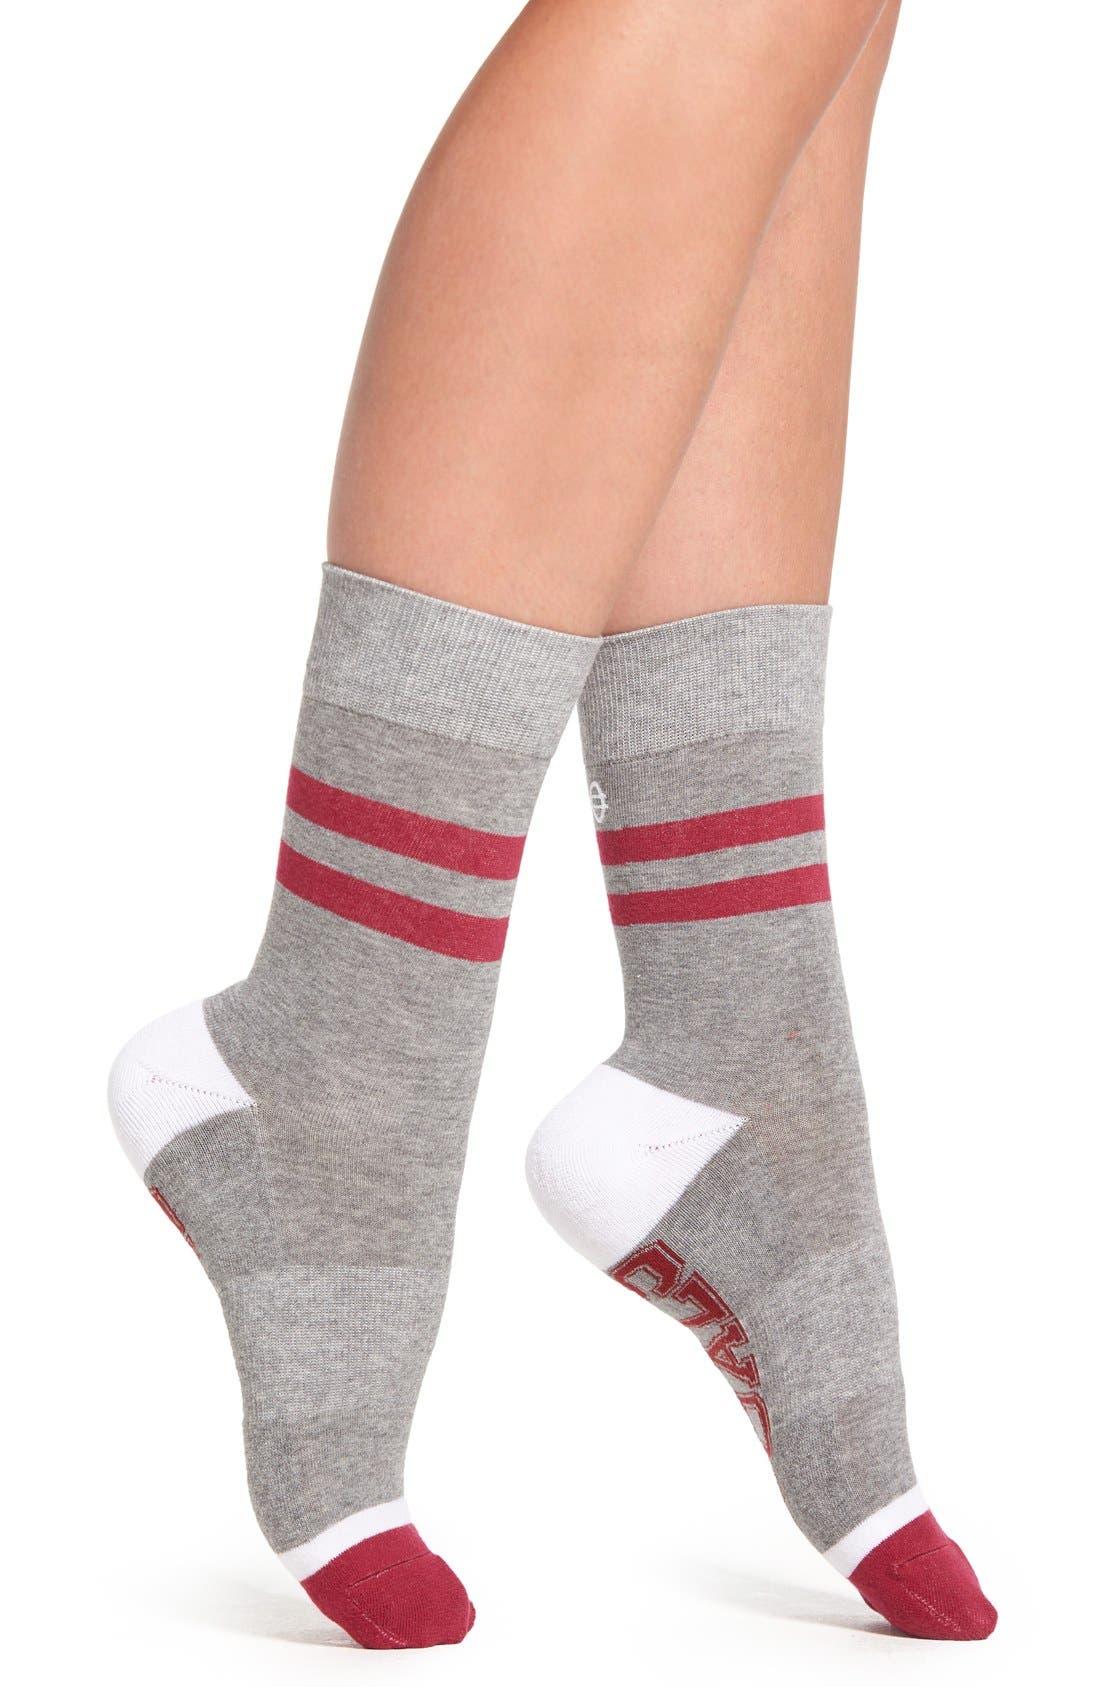 SOCKART, 'Squad Goals' Crew Socks, Alternate thumbnail 3, color, 060